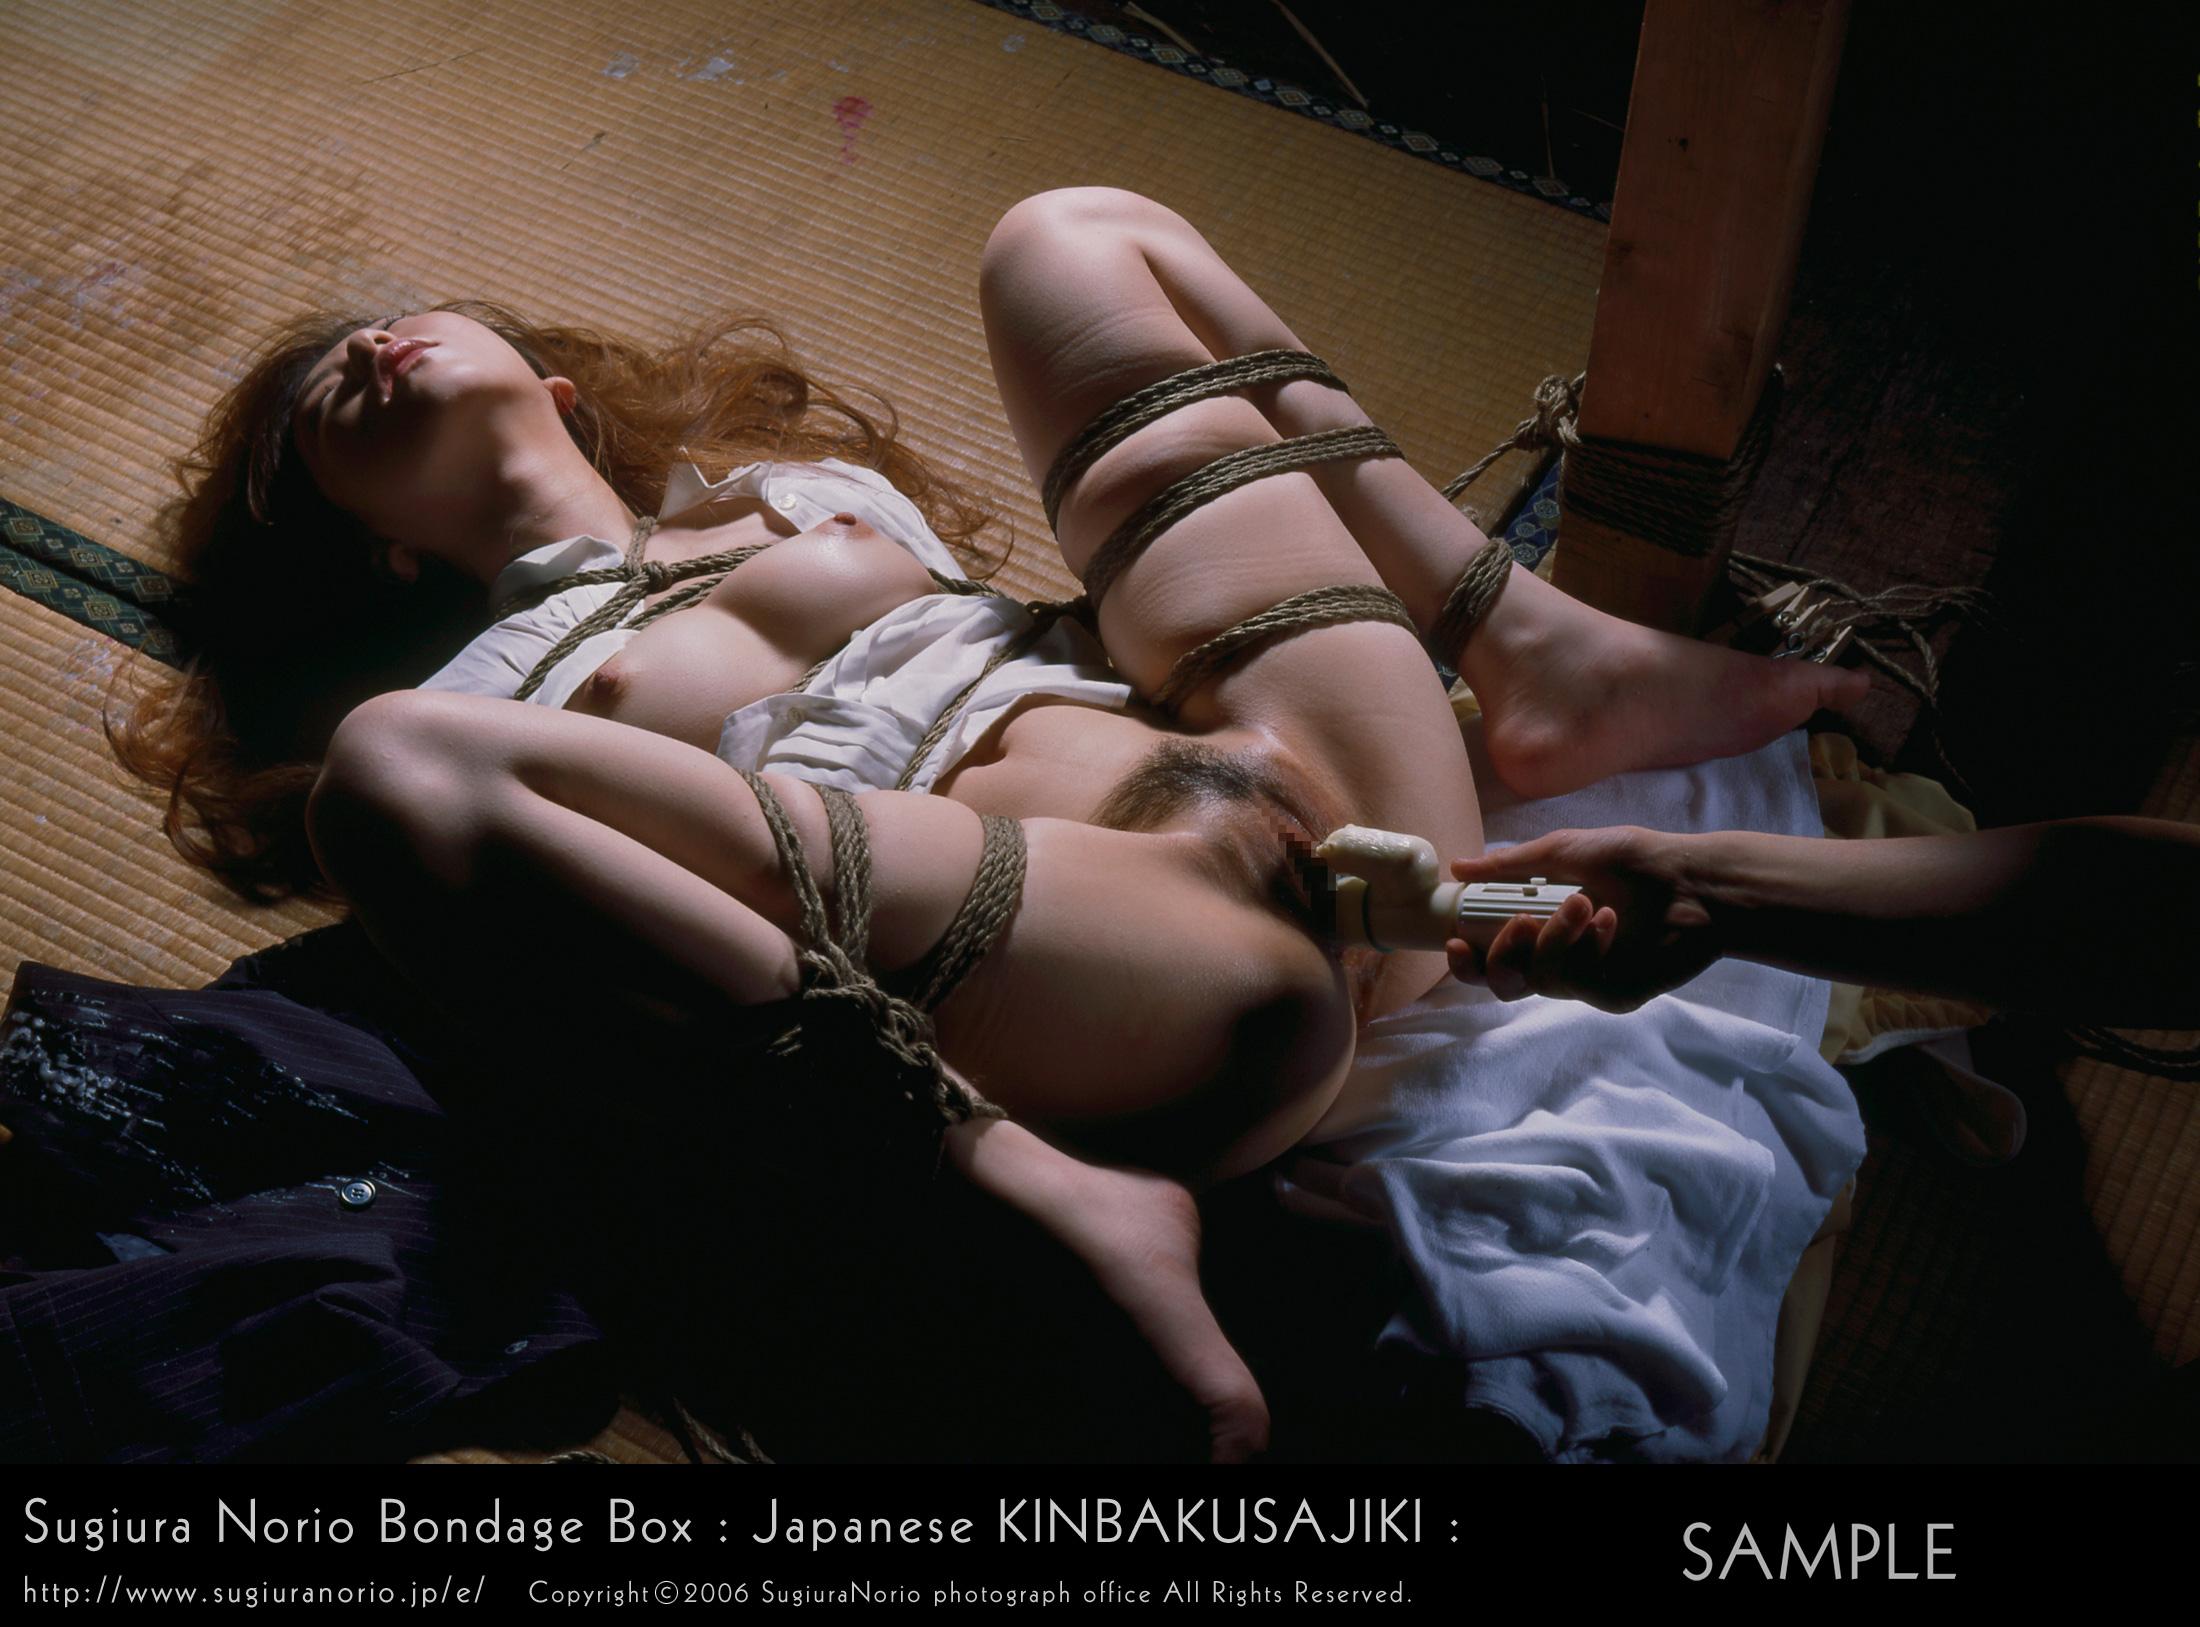 SM | SugiuraNorio Bondage Box : Japanese KINBAKUSAJIKI :: http://www.sugiuranorio.jp/e/download/in/014.html